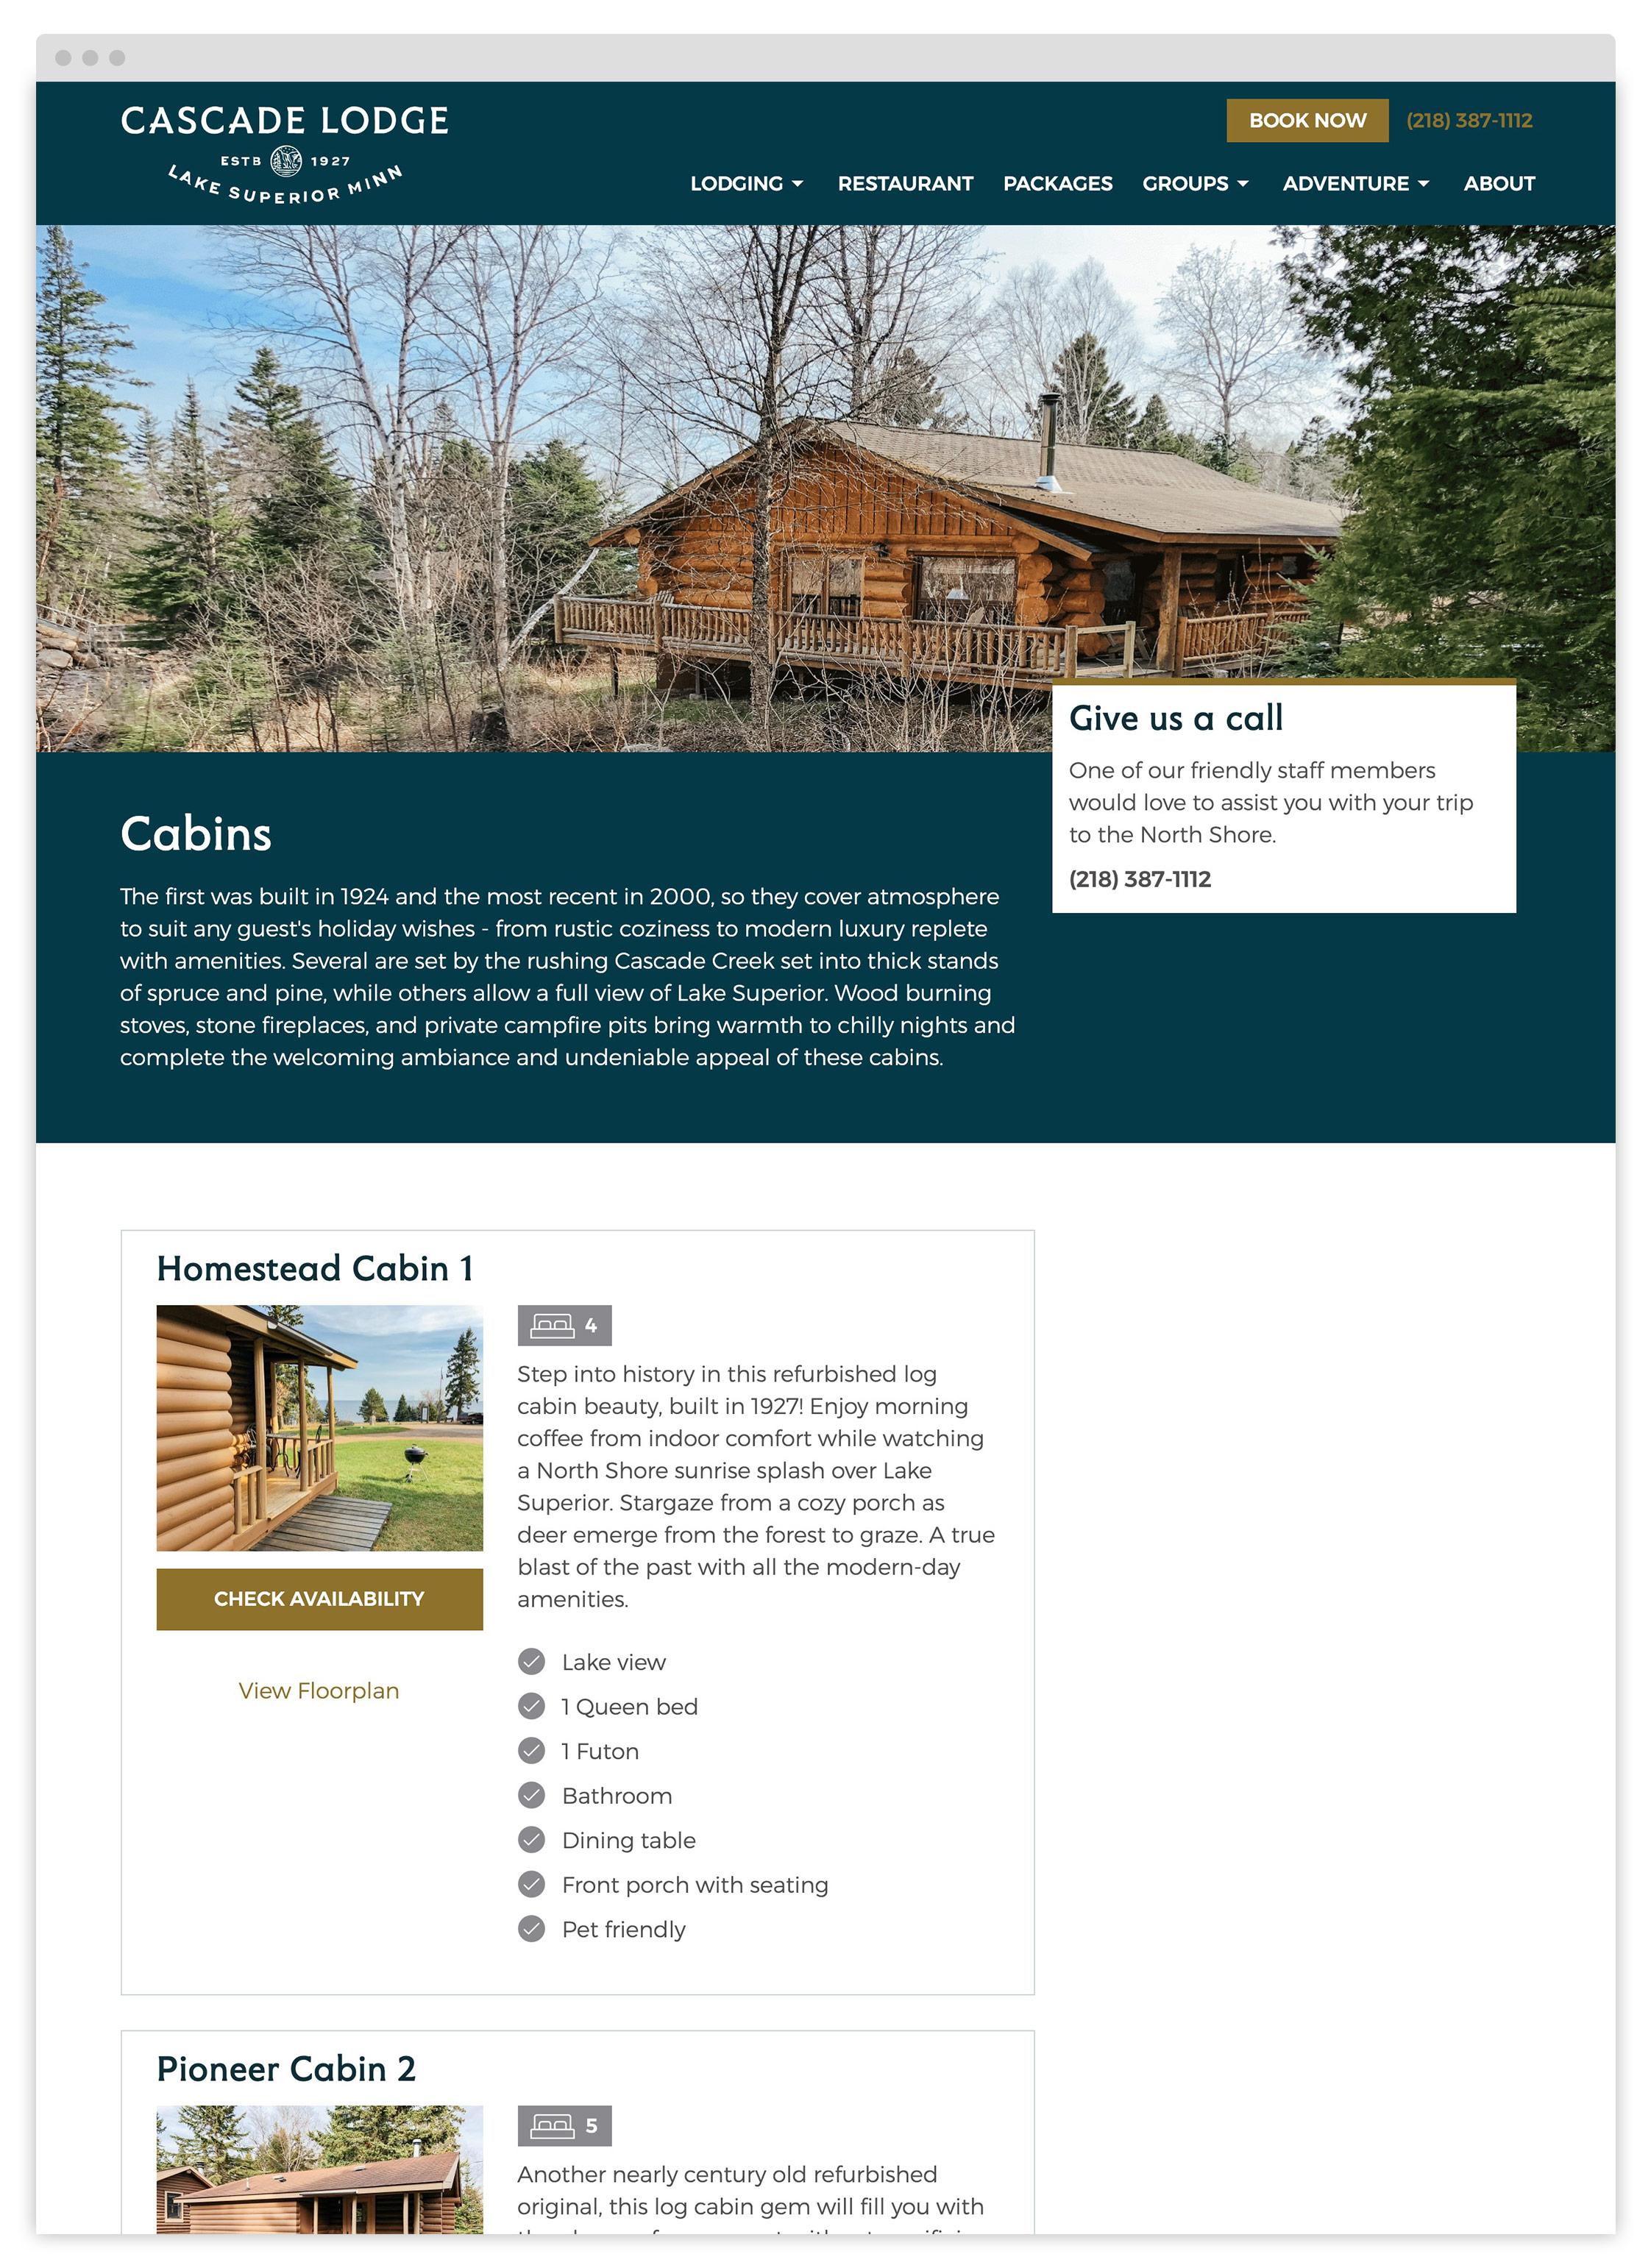 Cascade Lodge Cabins